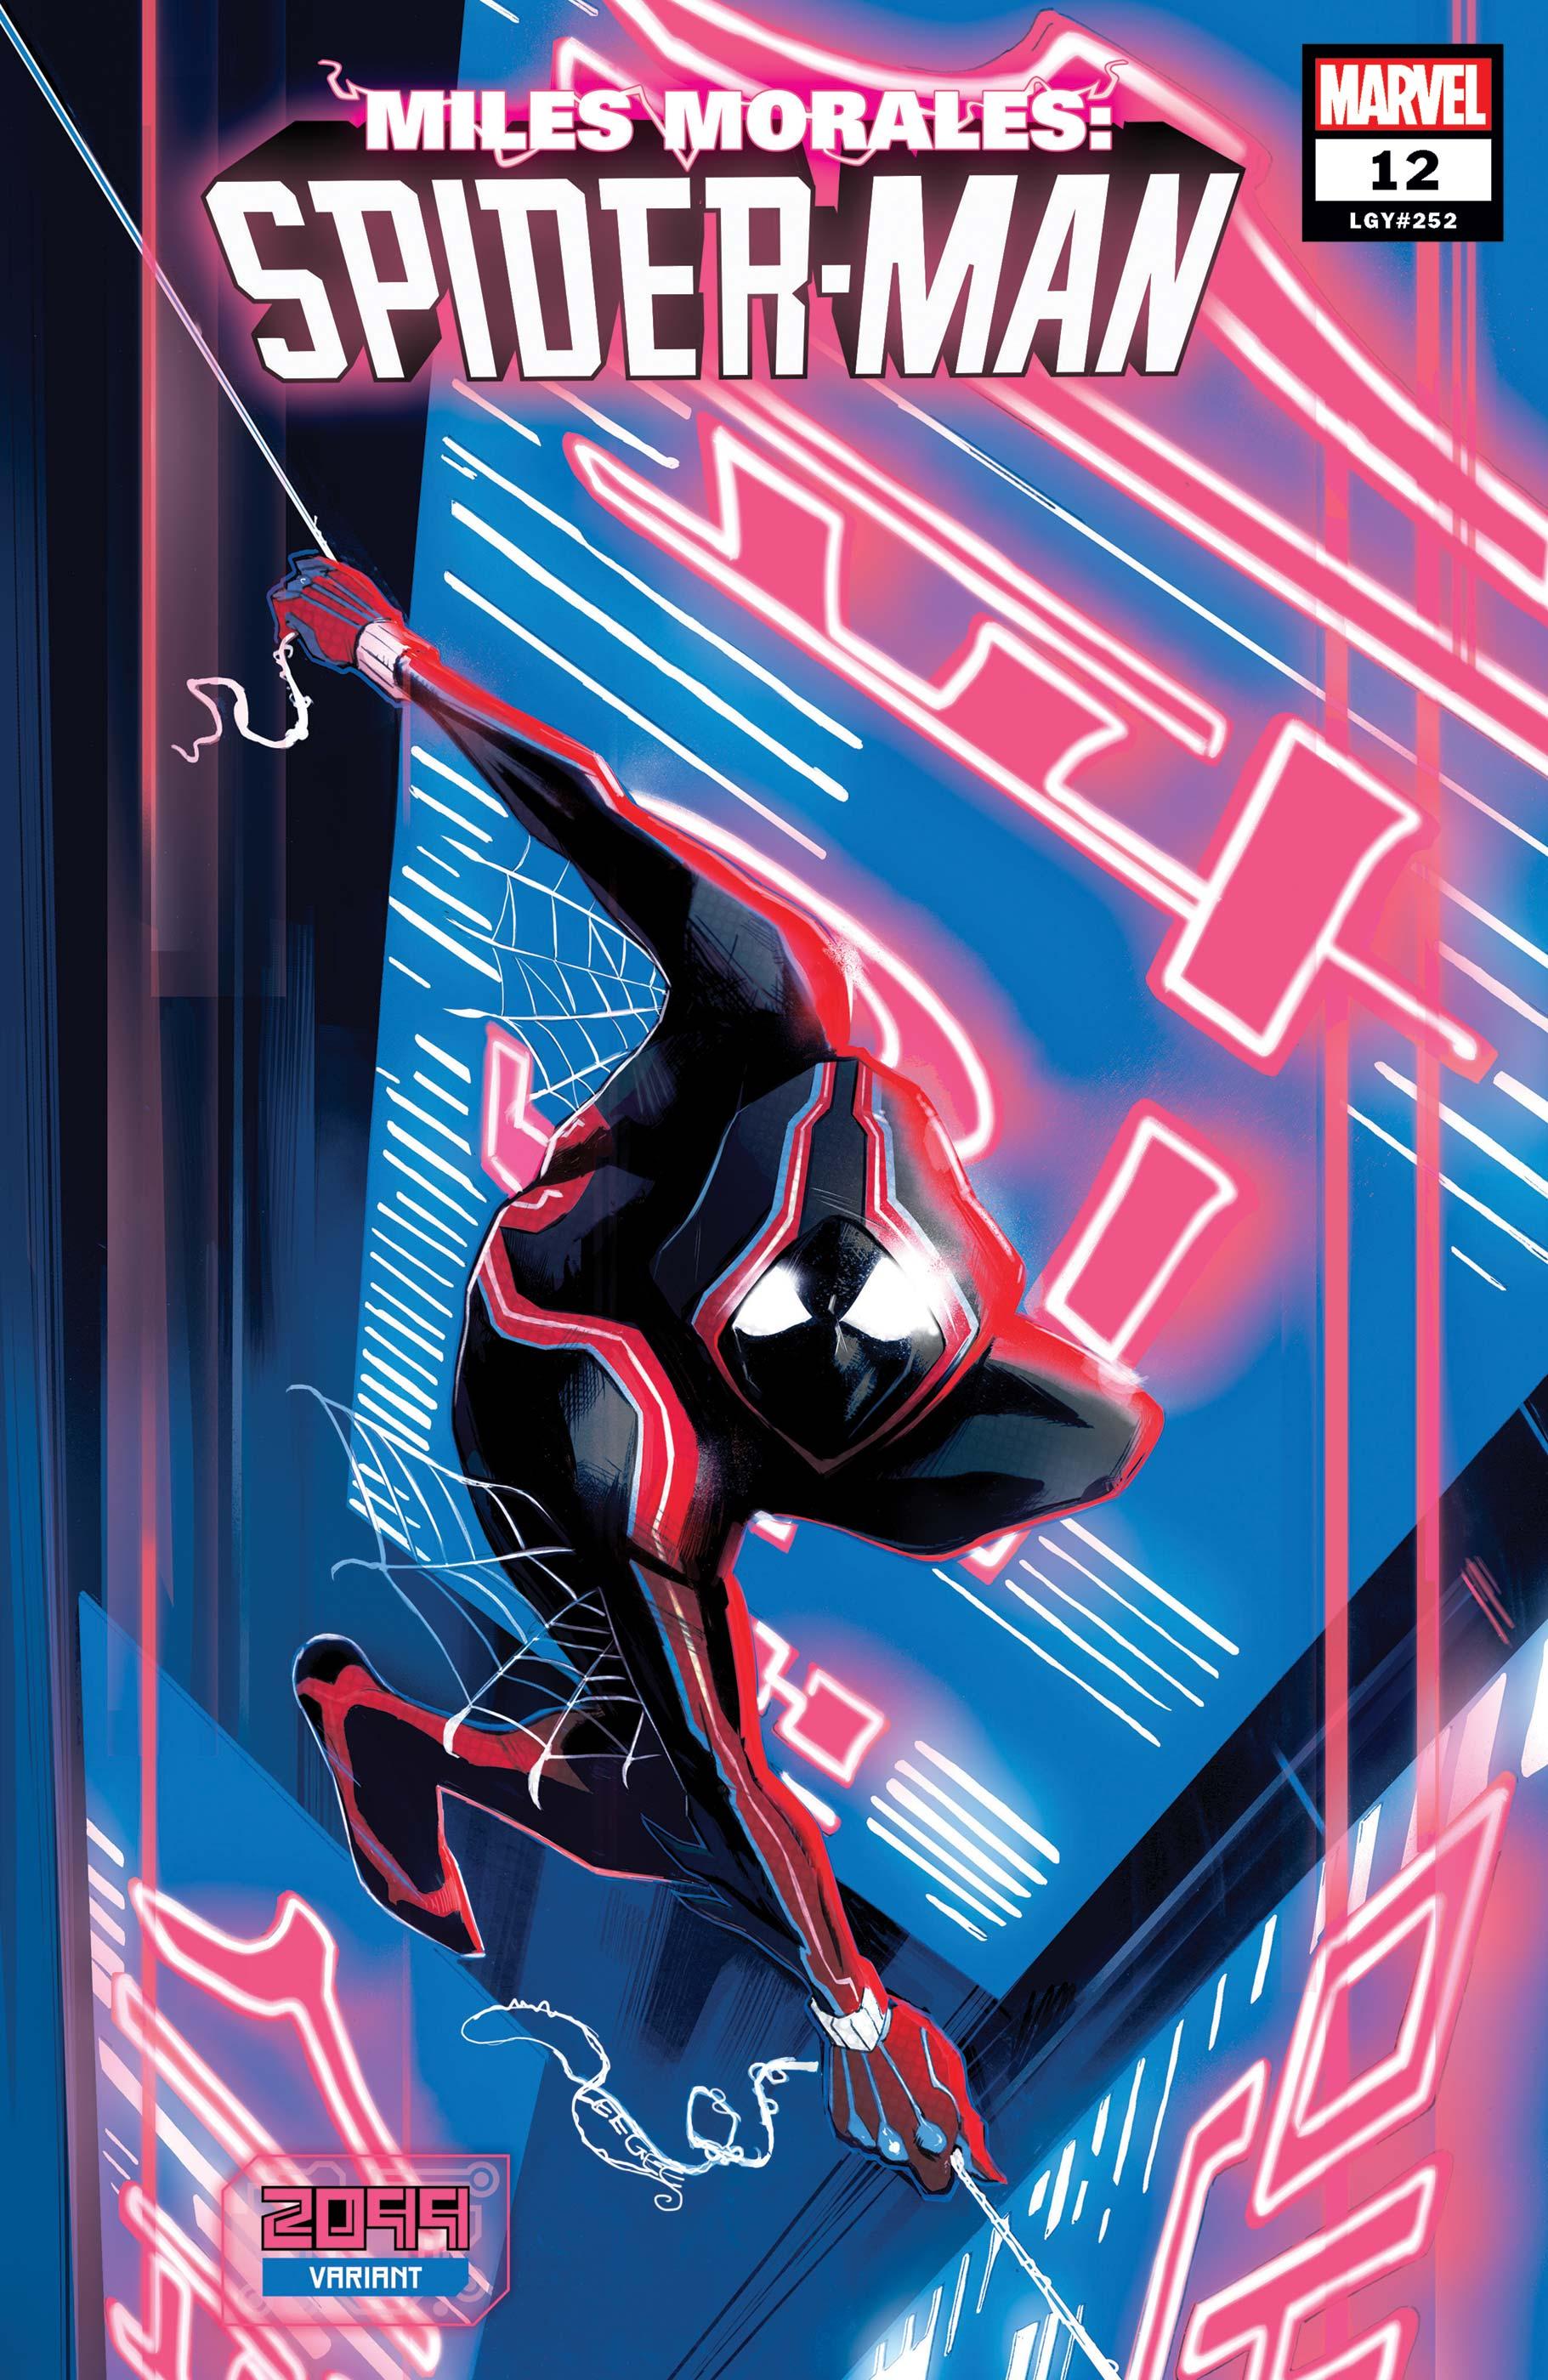 Miles Morales: Spider-Man (2018) #12 (Variant)